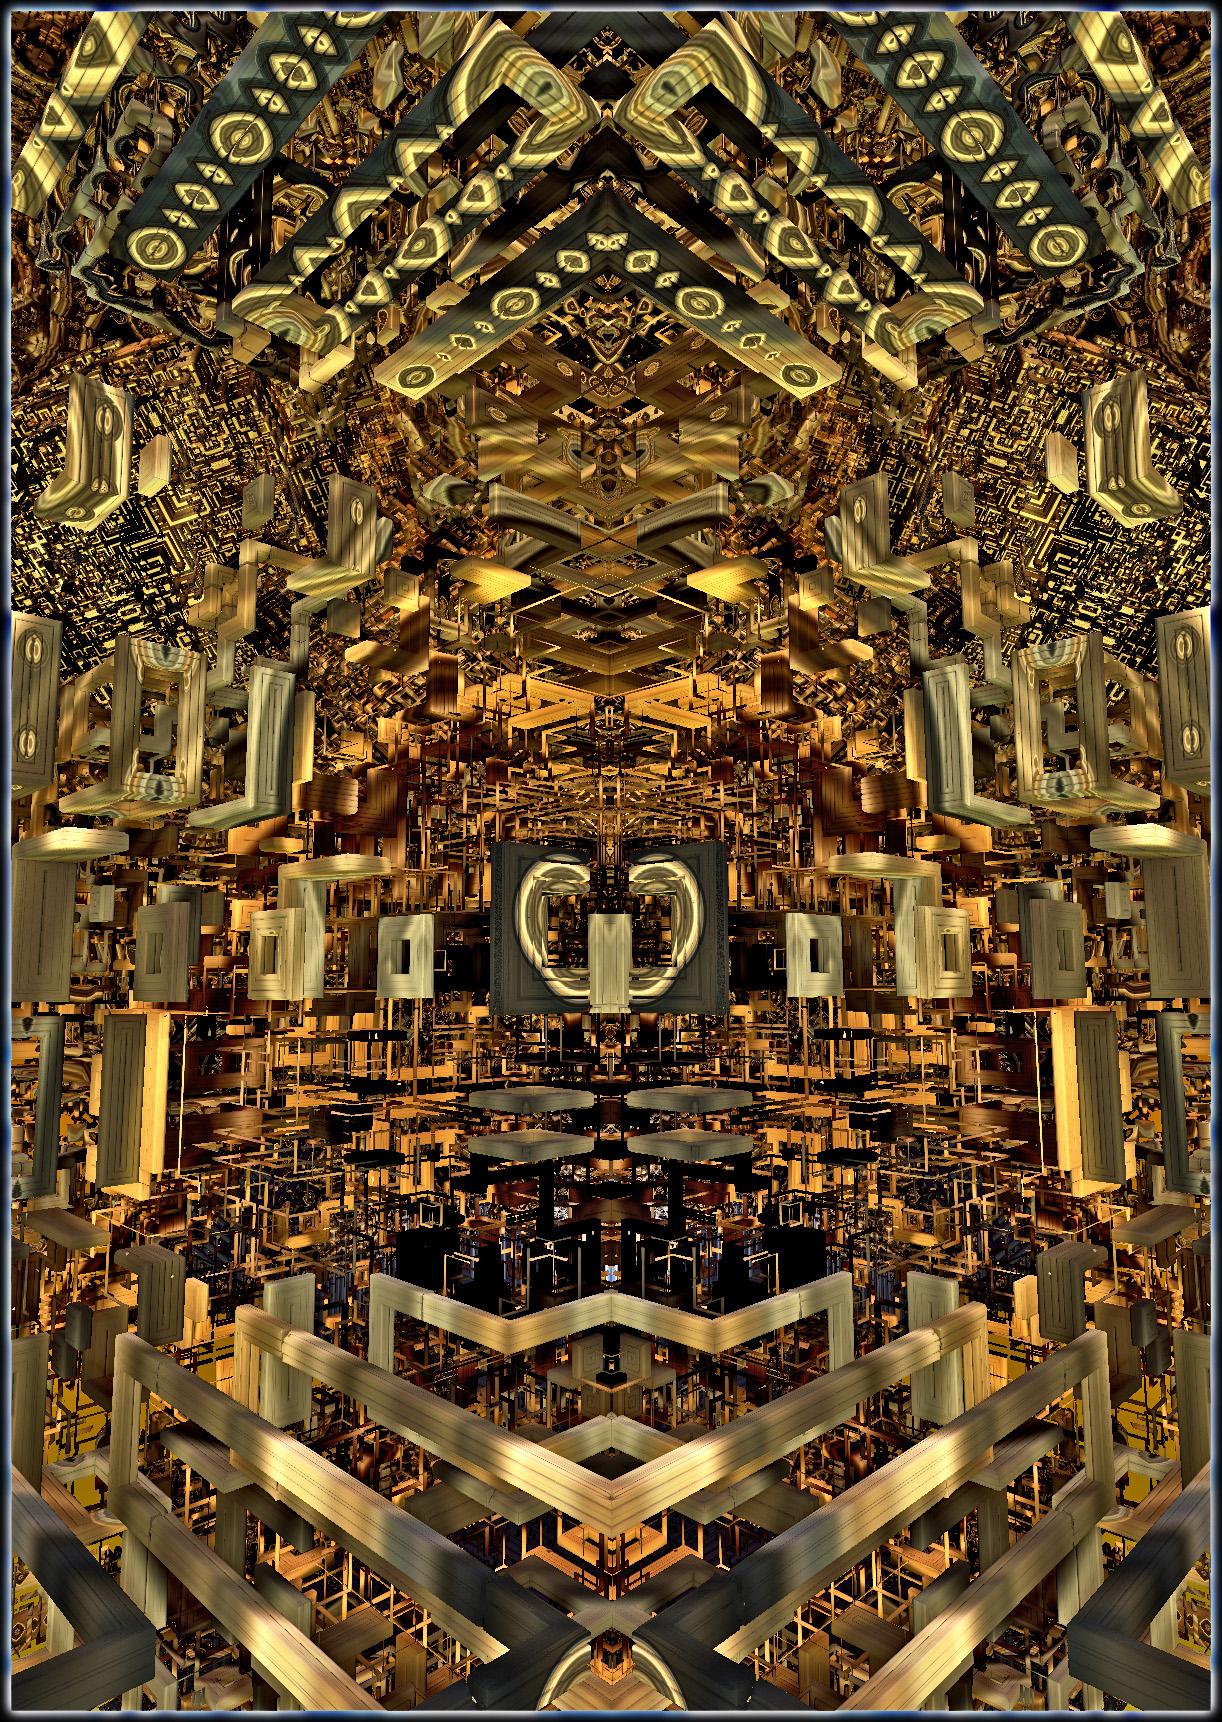 TBE-X1 by Vidom